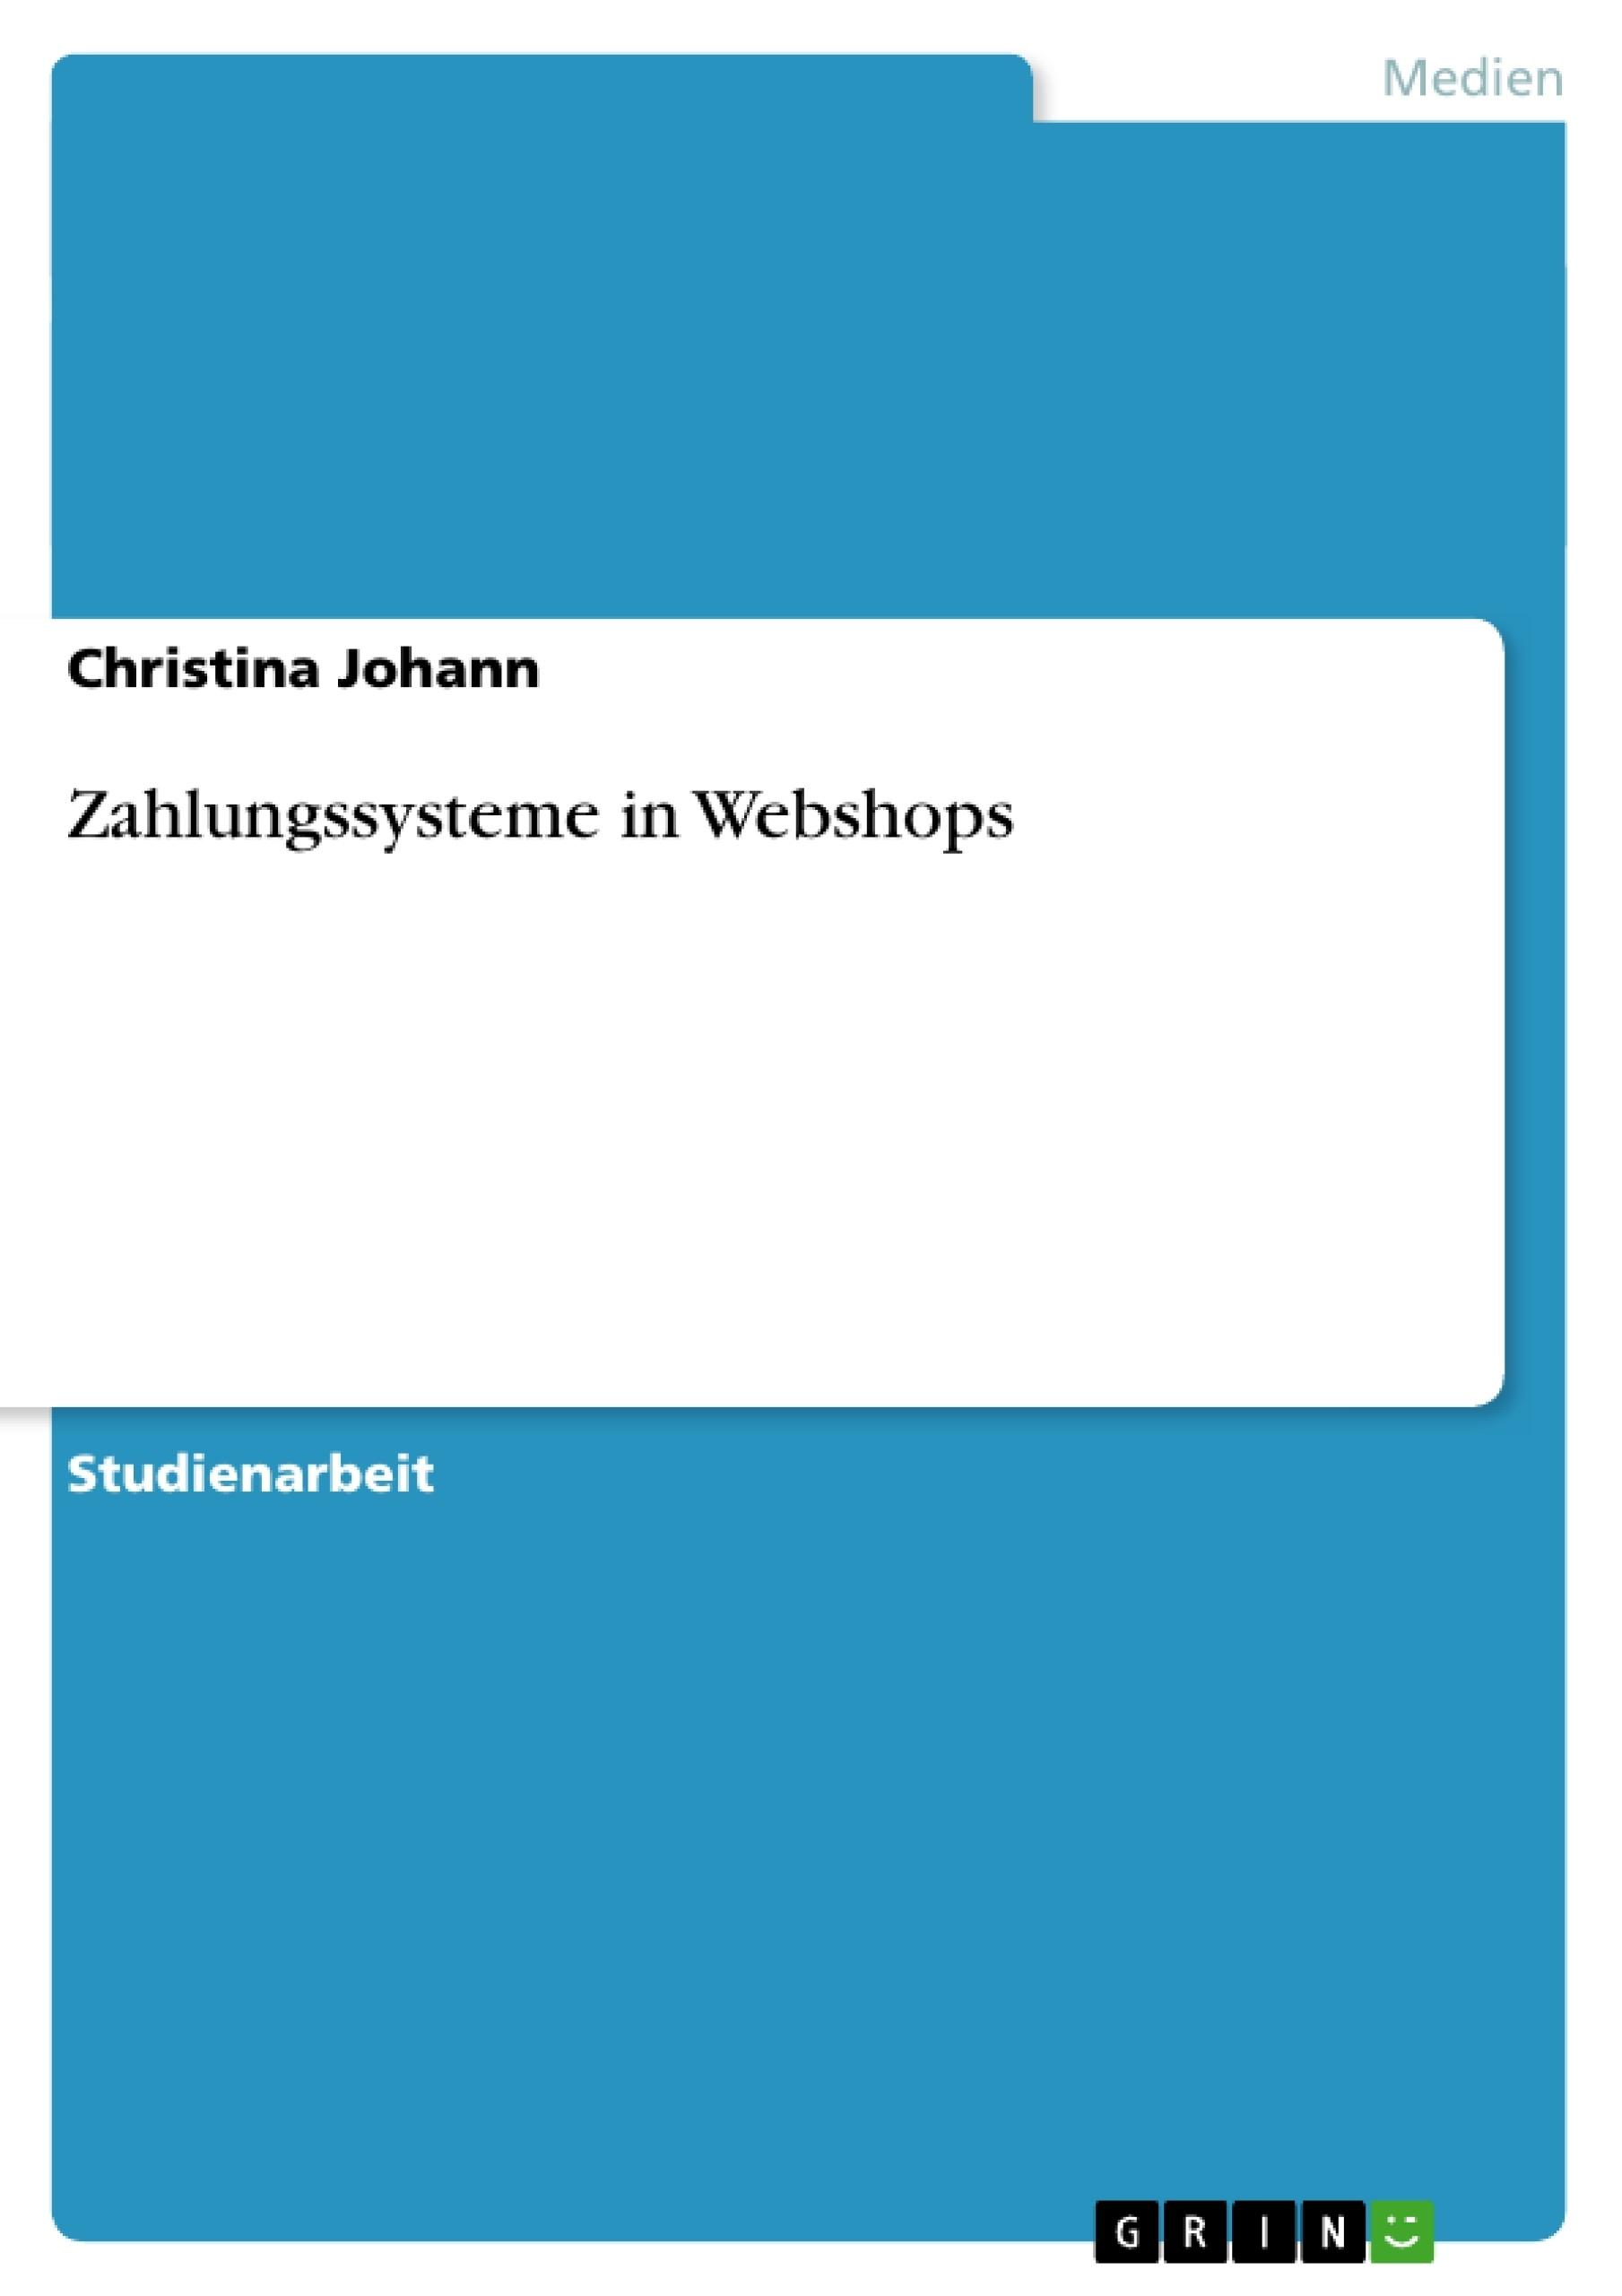 Titel: Zahlungssysteme in Webshops